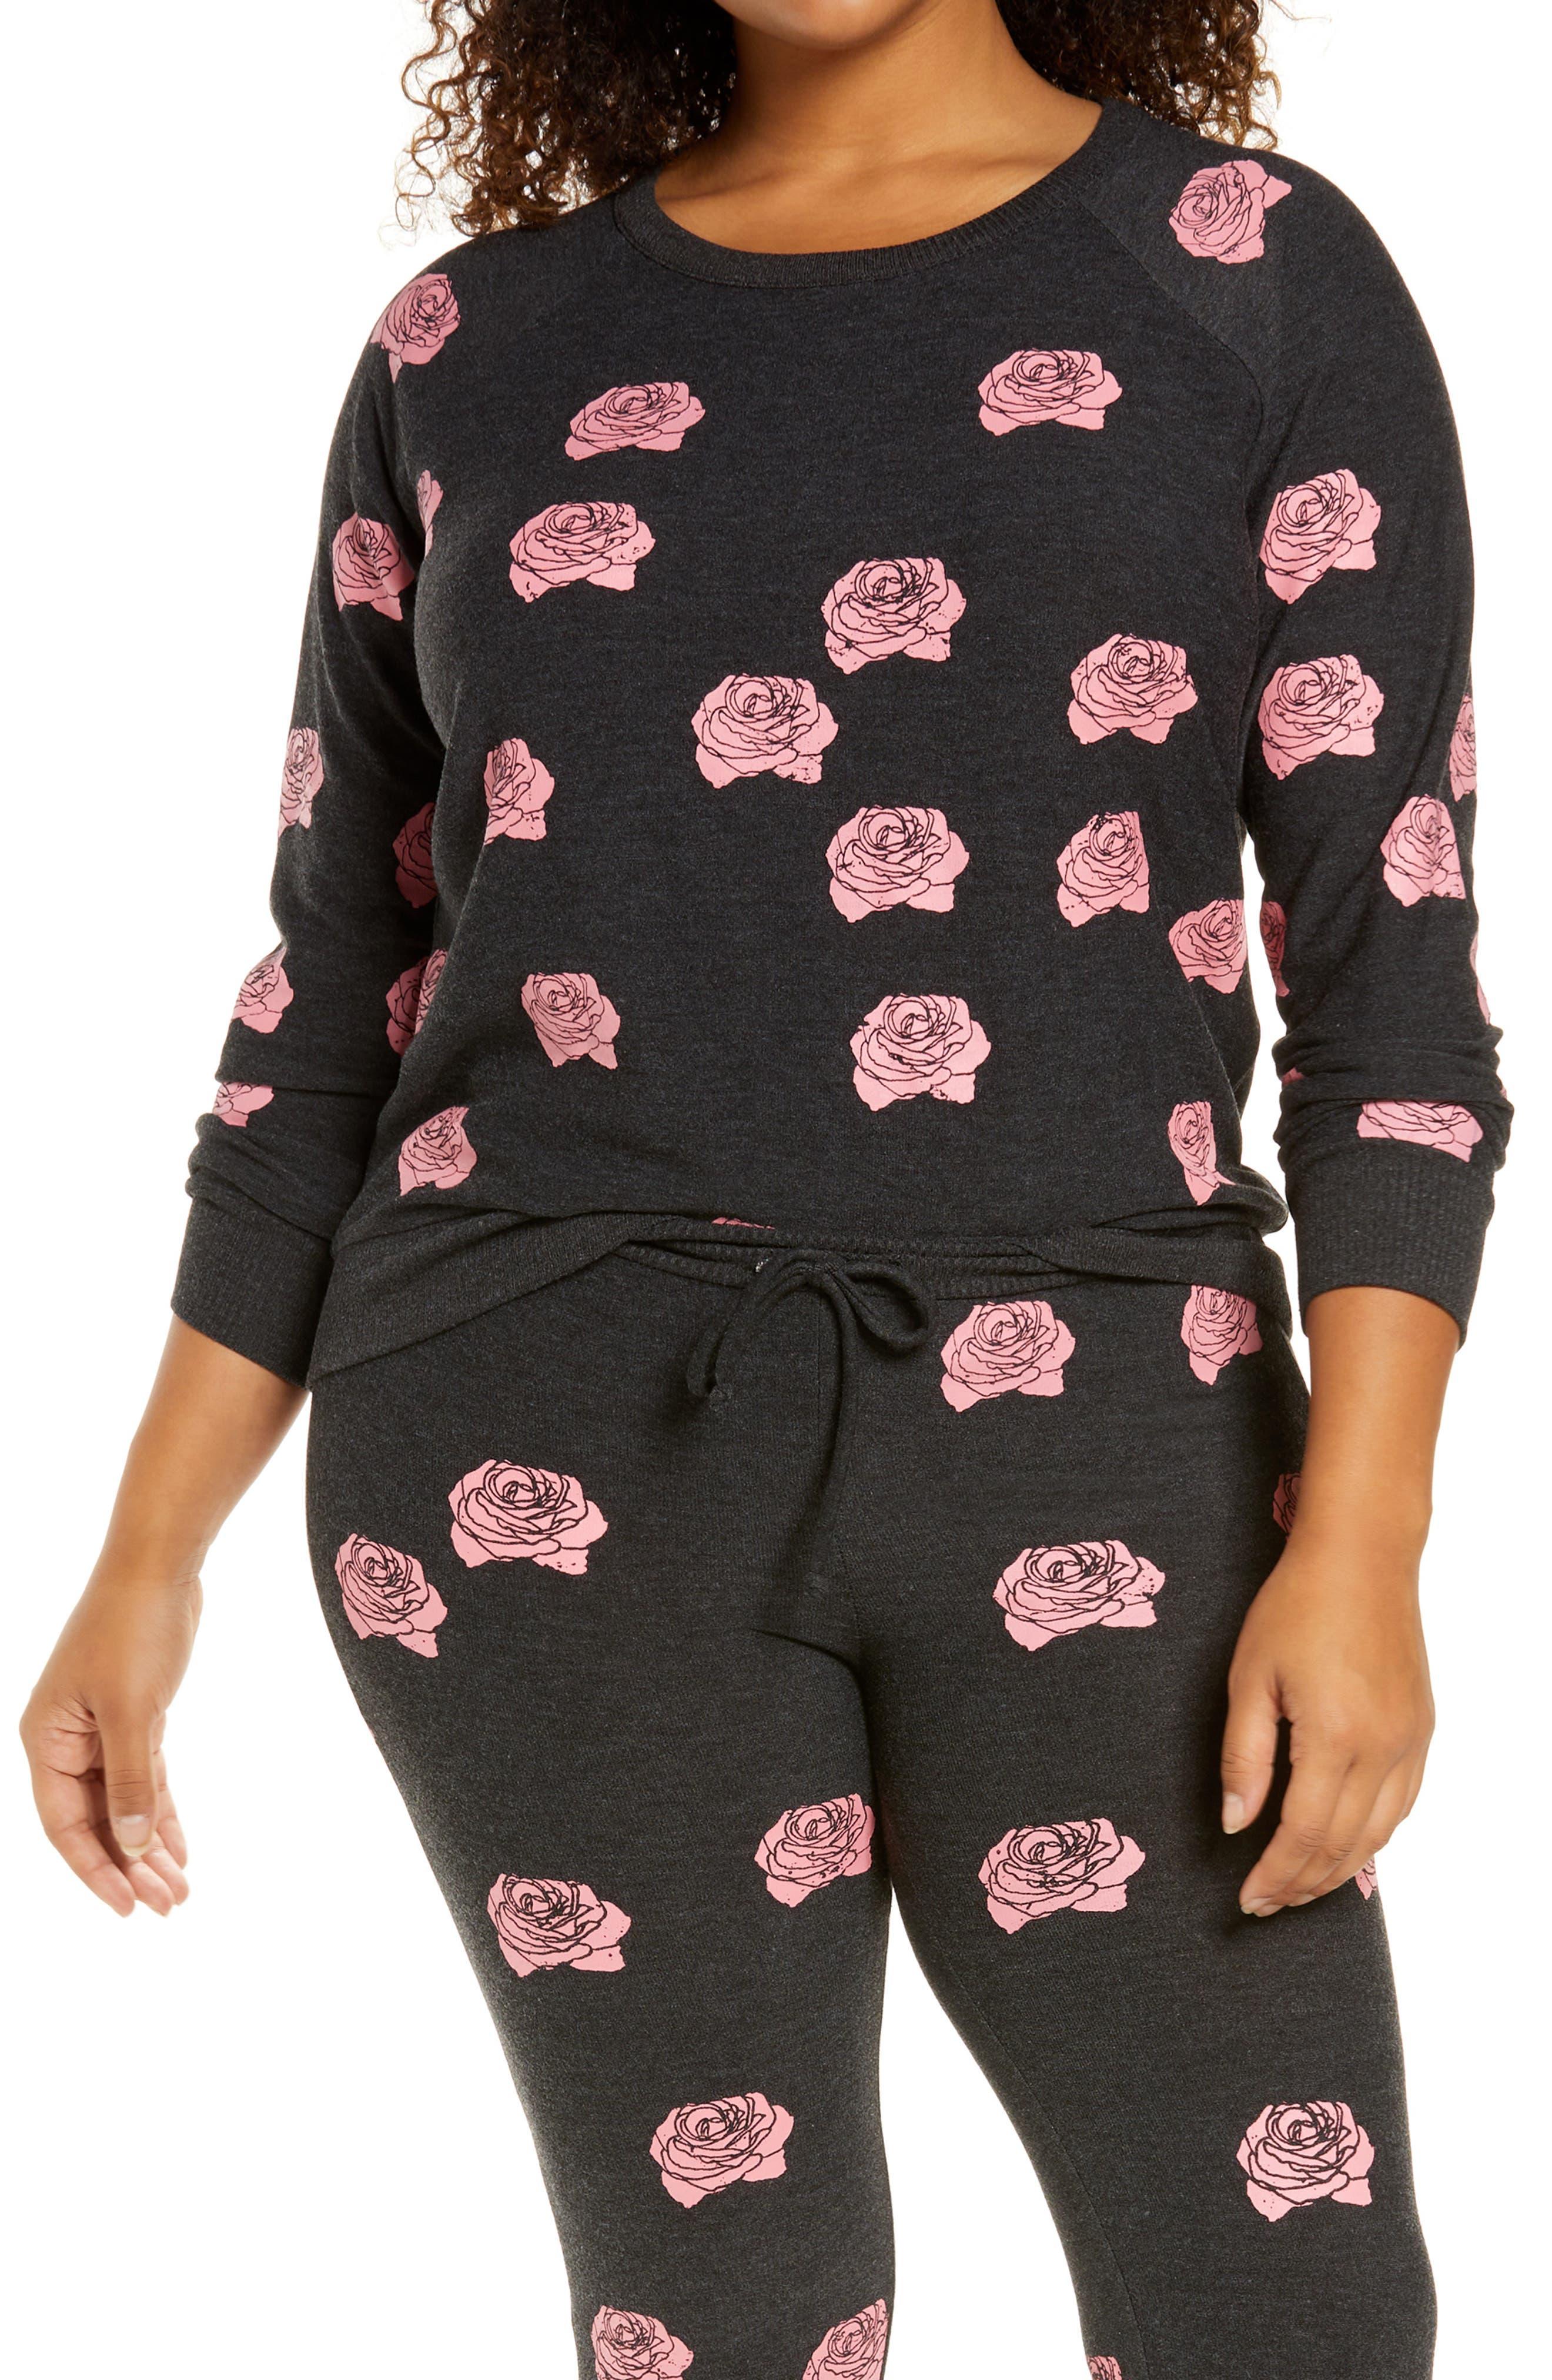 Rose Print Pullover